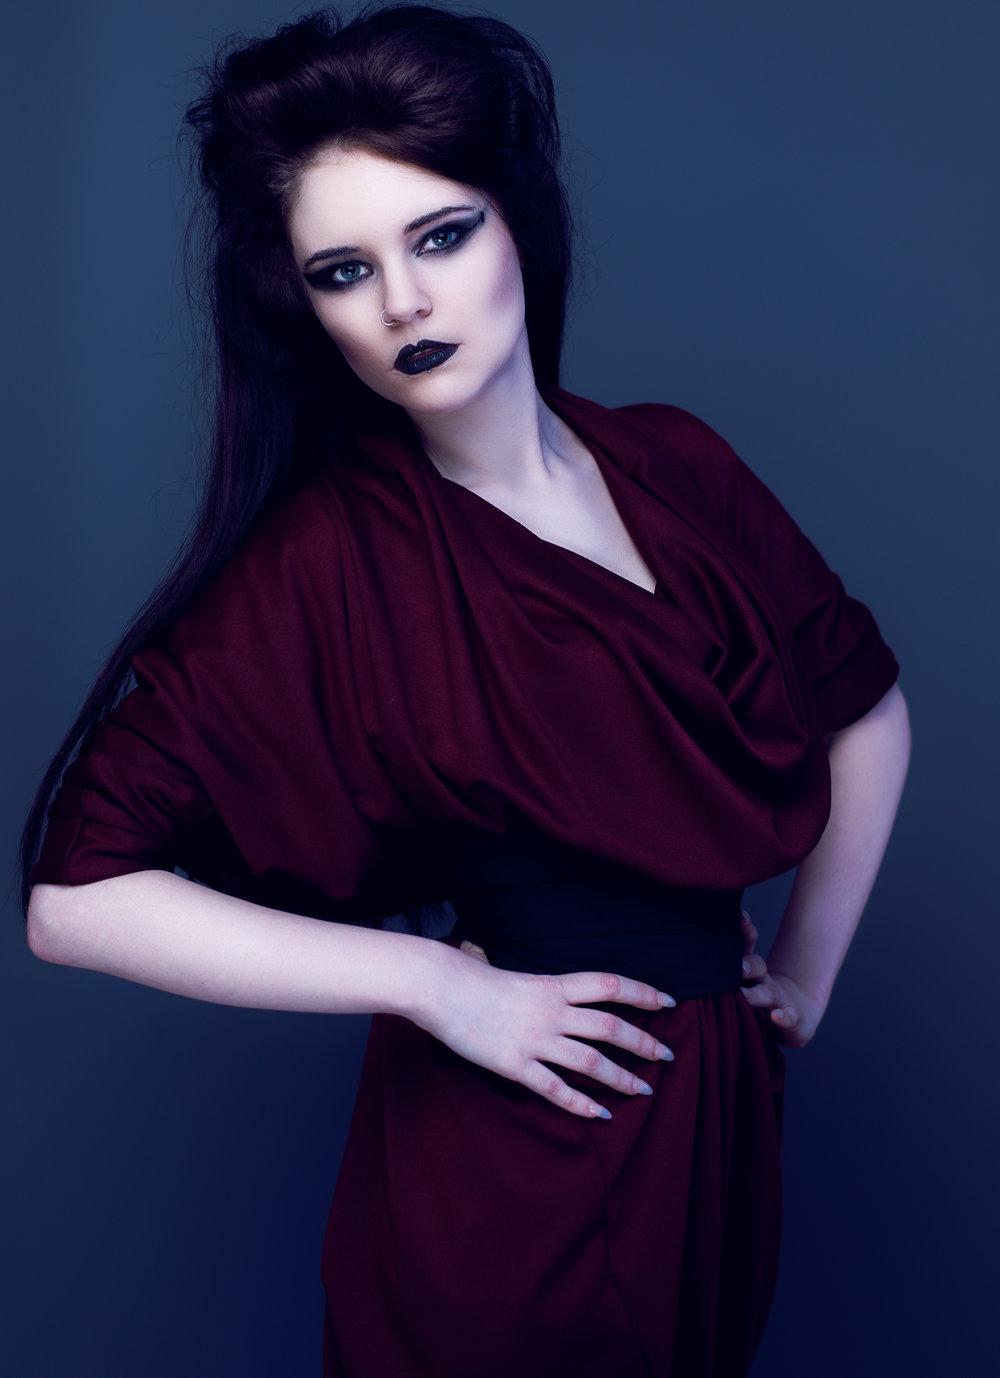 zaramia-ava-zaramiaava-leeds-fashion-designer-ethical-sustainable-tailored-minimalist-aya-burgundy-black-obi-belt-dress-versatile-drape-cowl-styling-studio-womenswear-models-photoshoot-vibrant-15